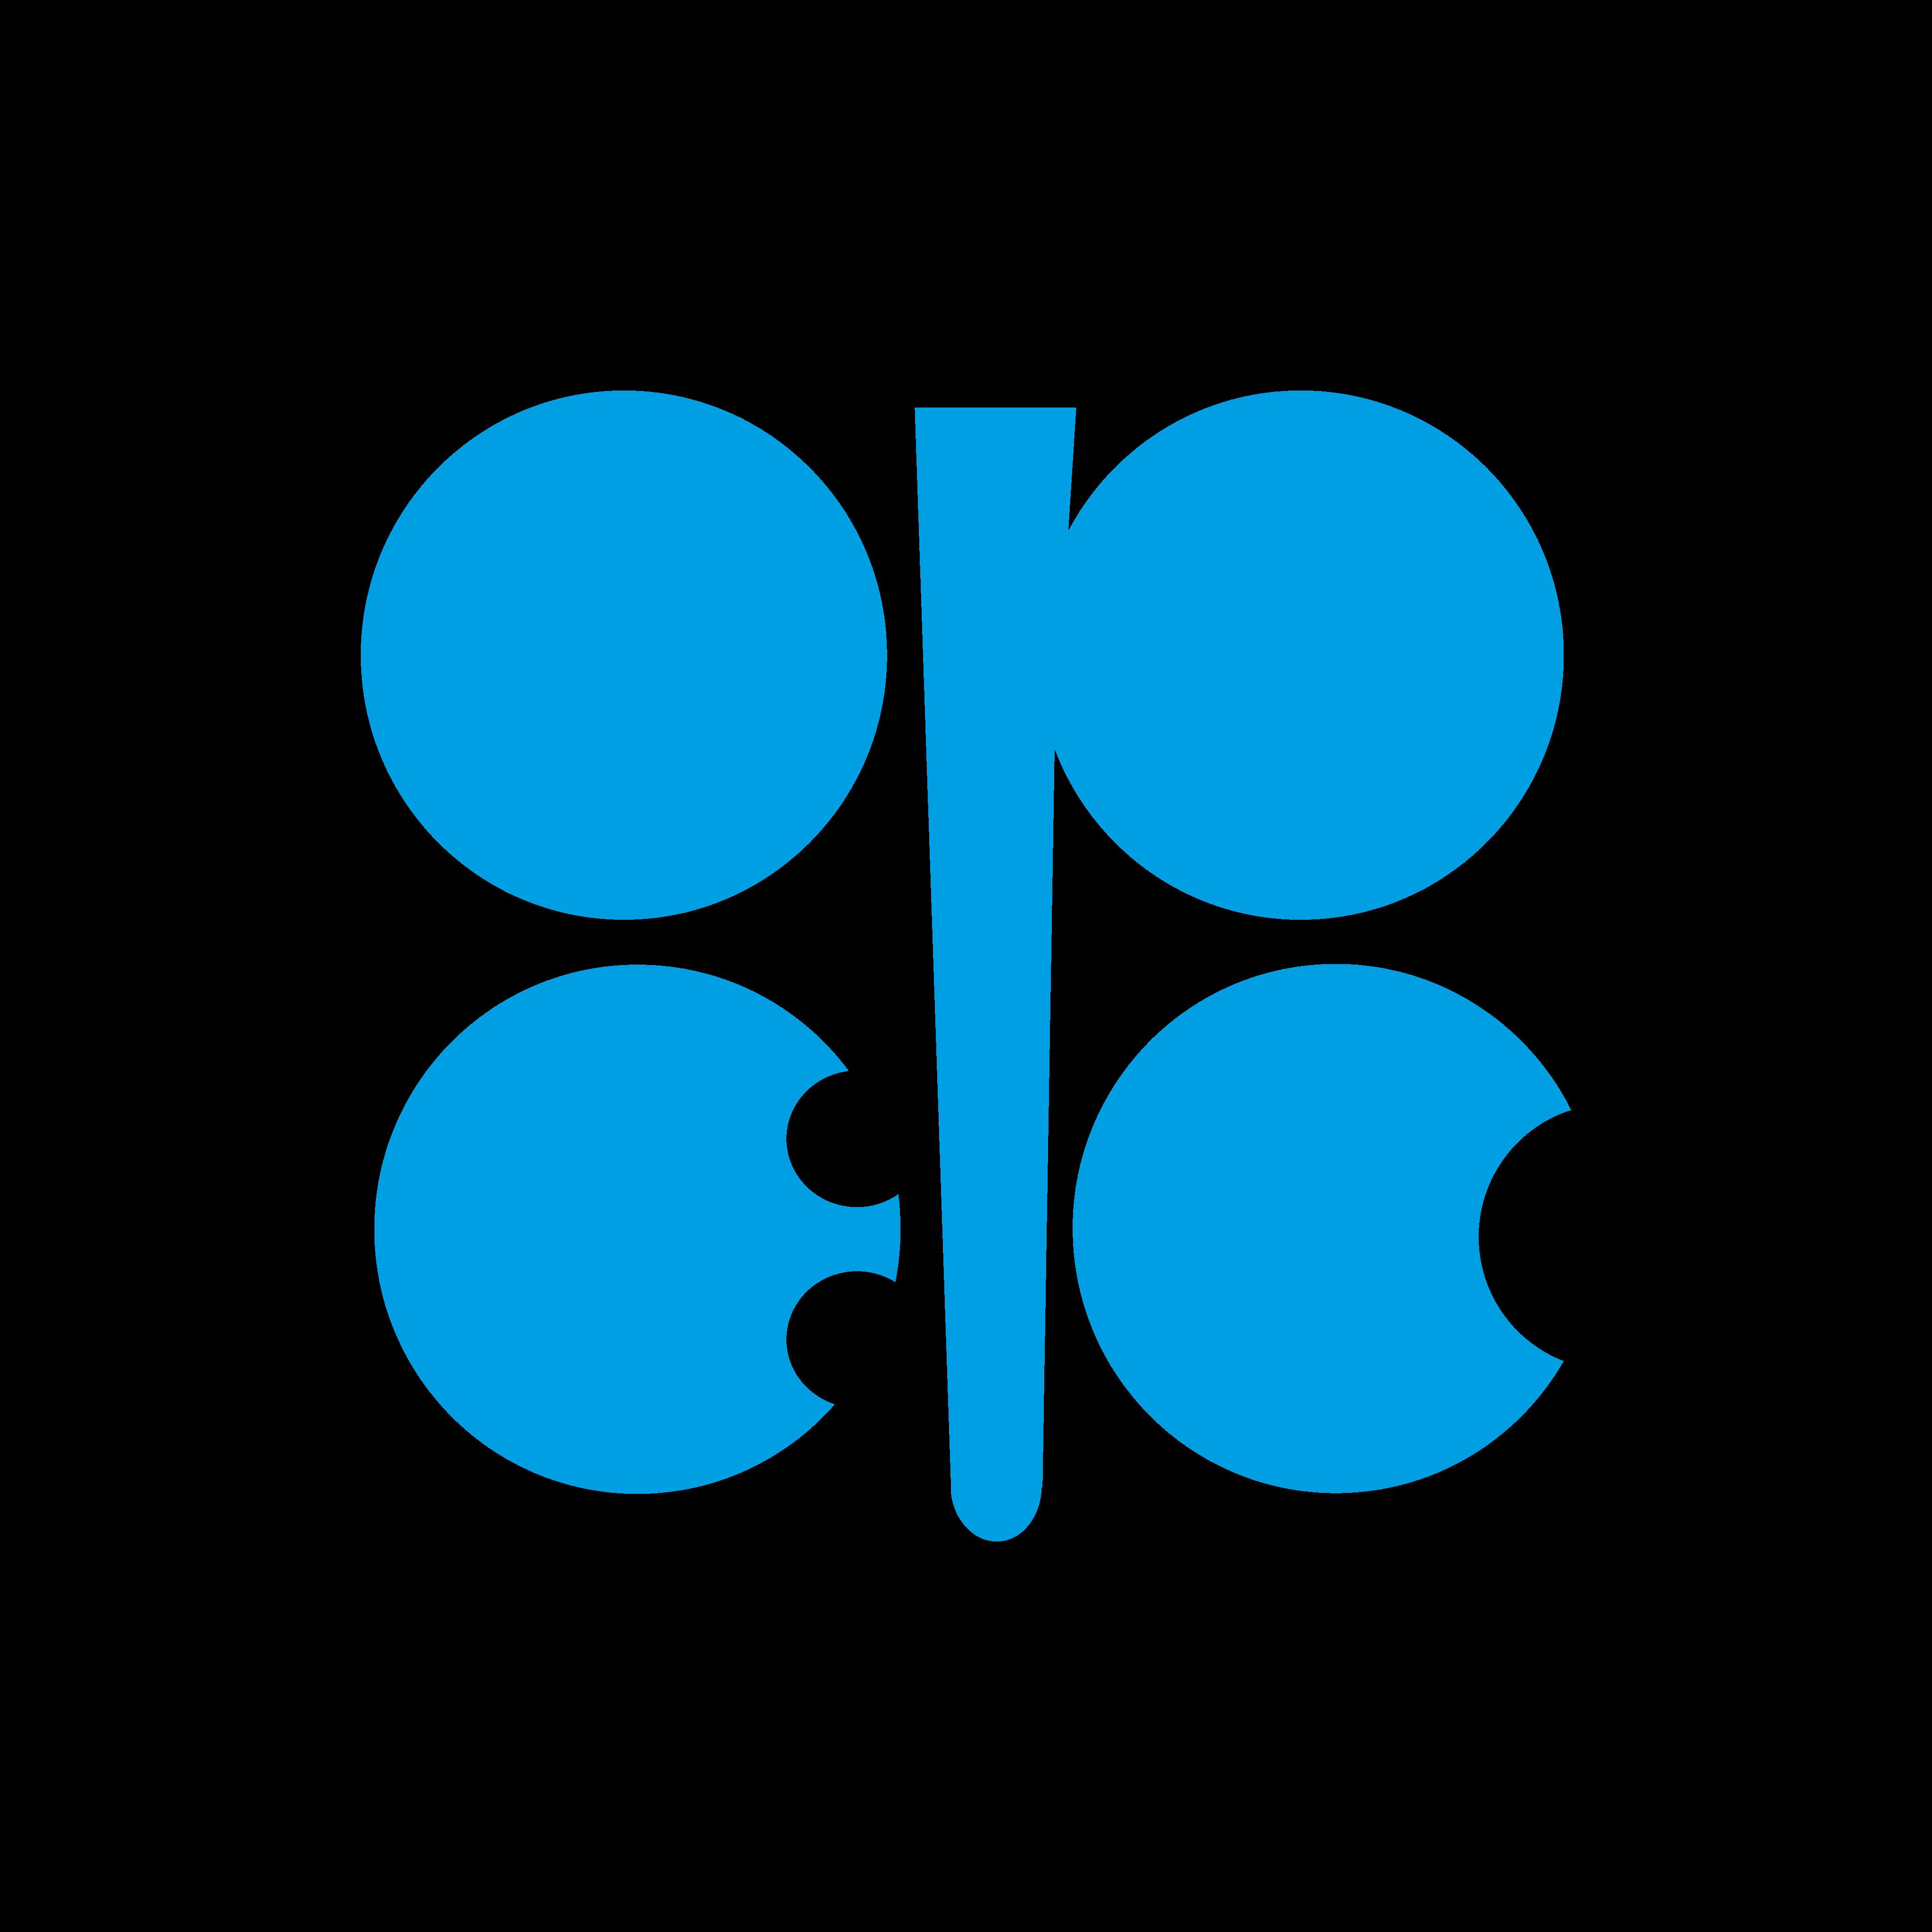 opec logo 0 - OPEC Logo